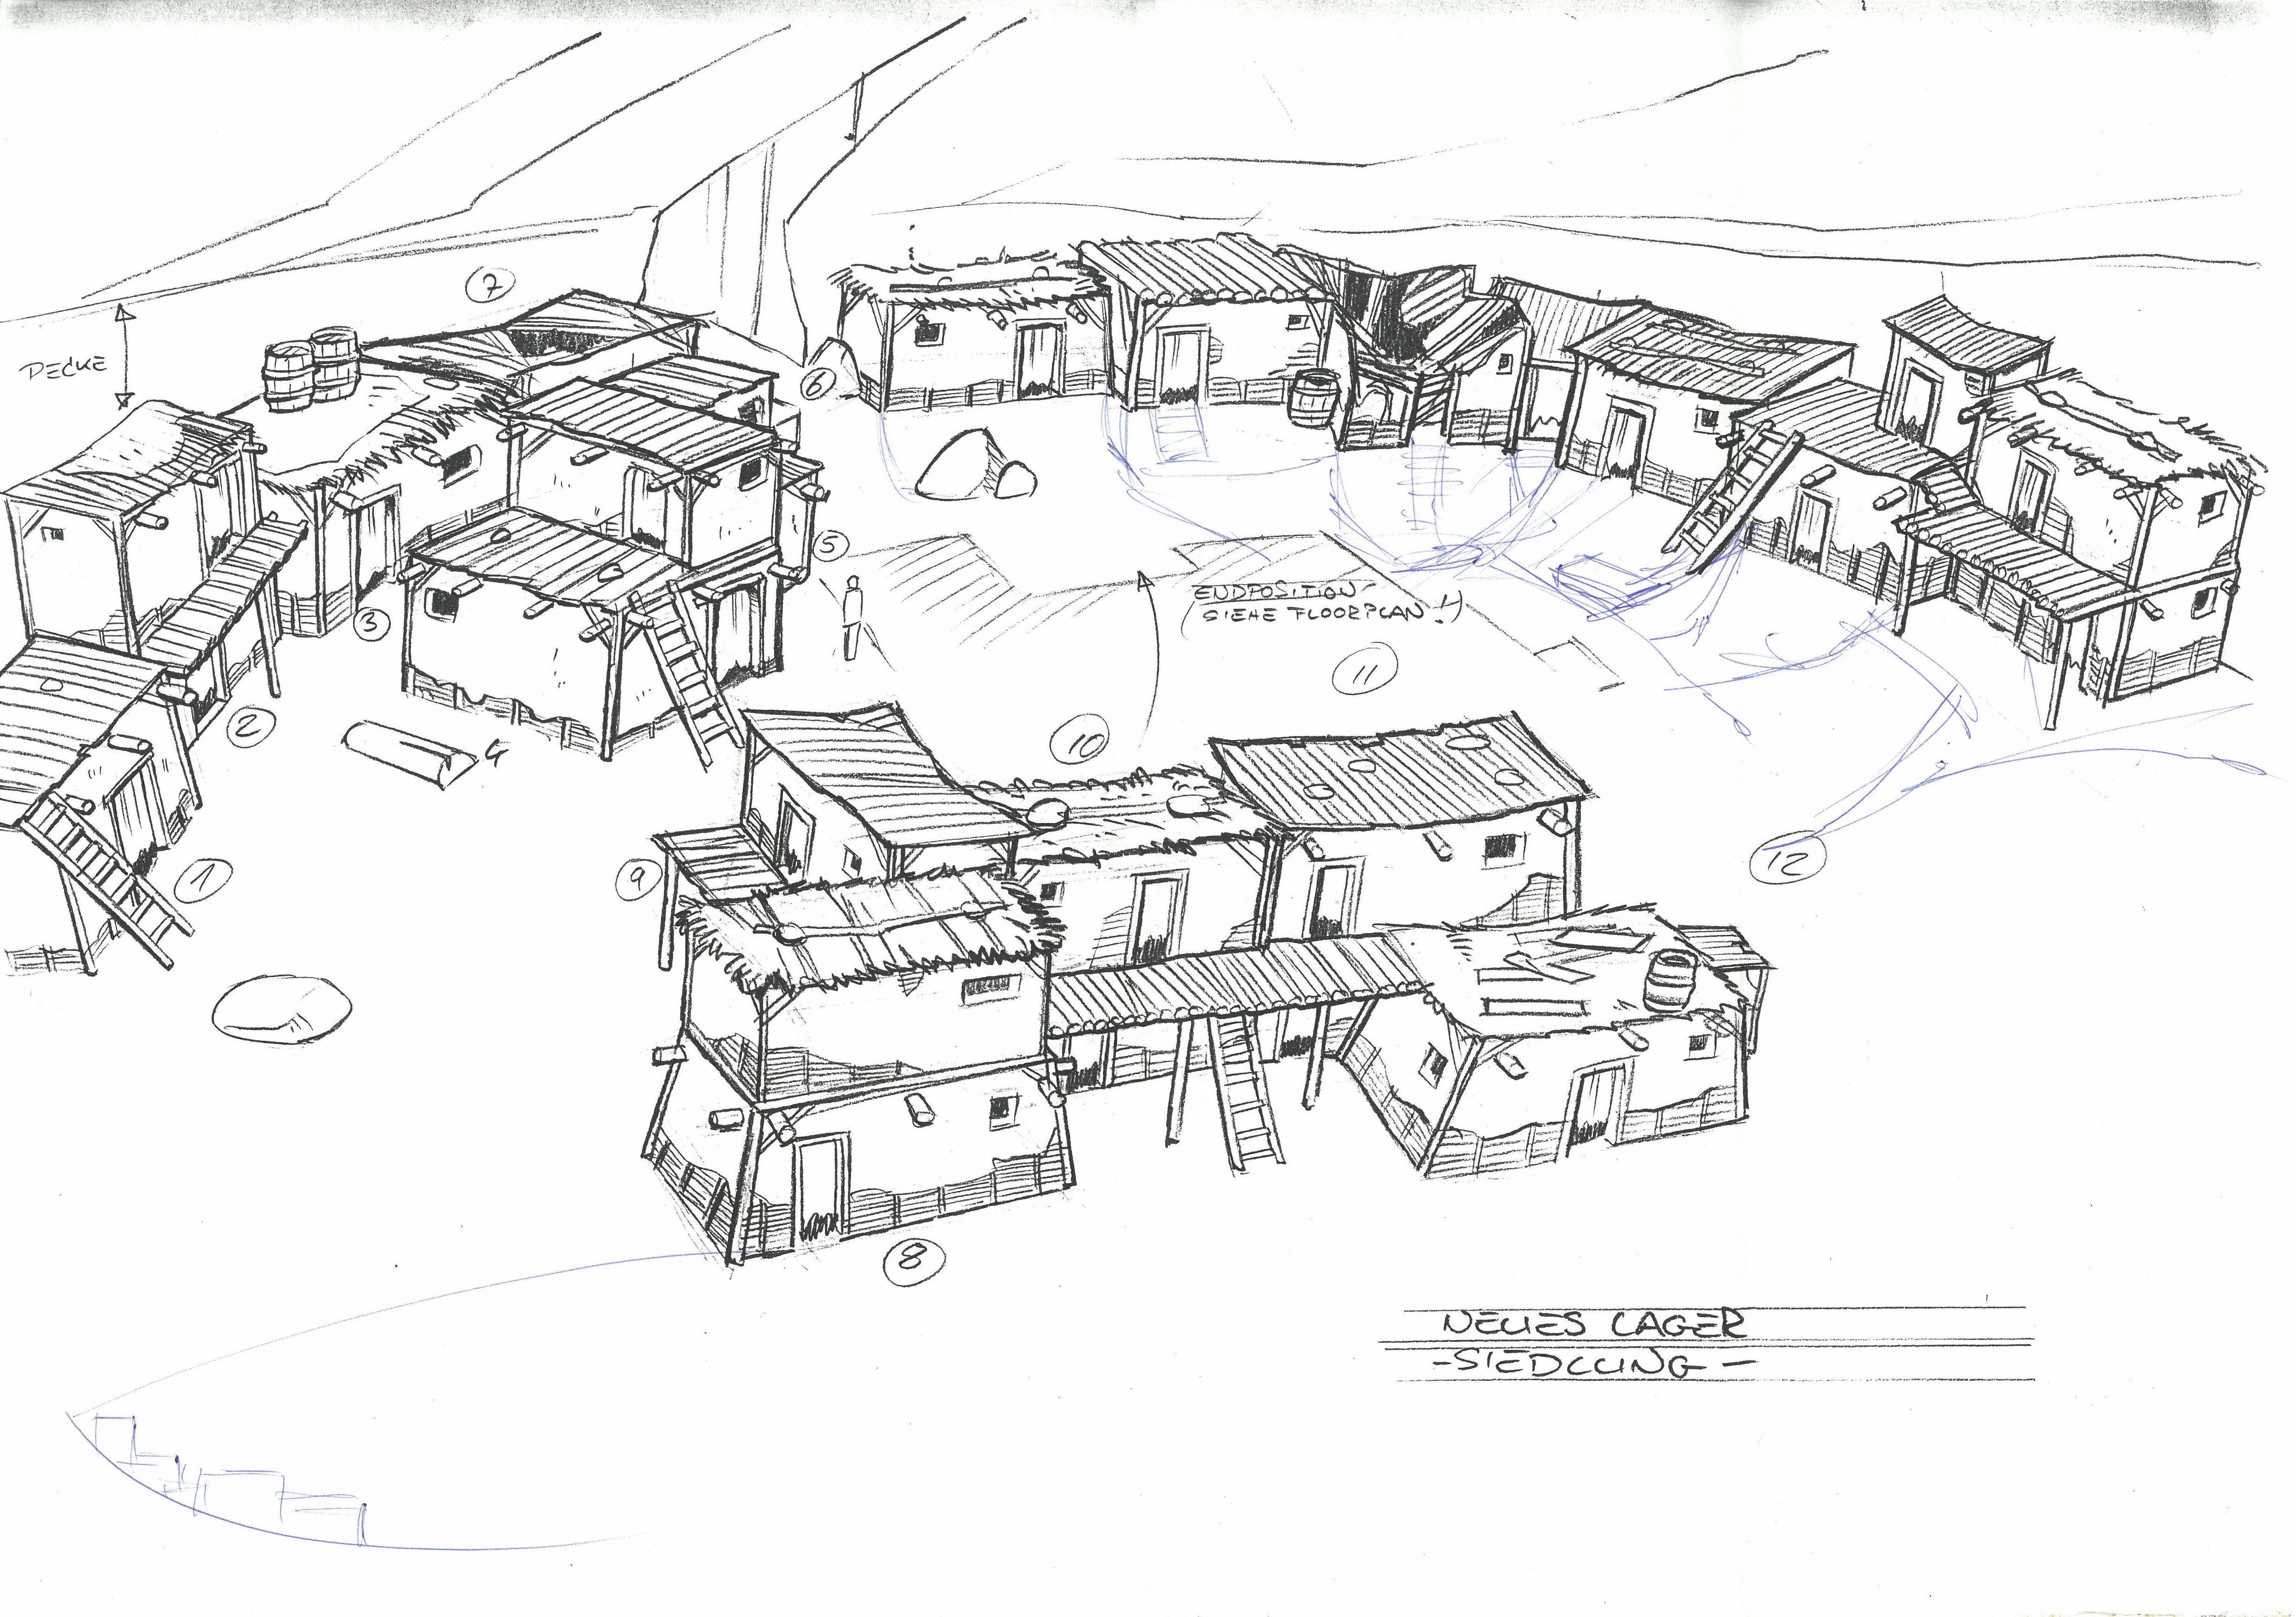 Neues Lager - Siedlung